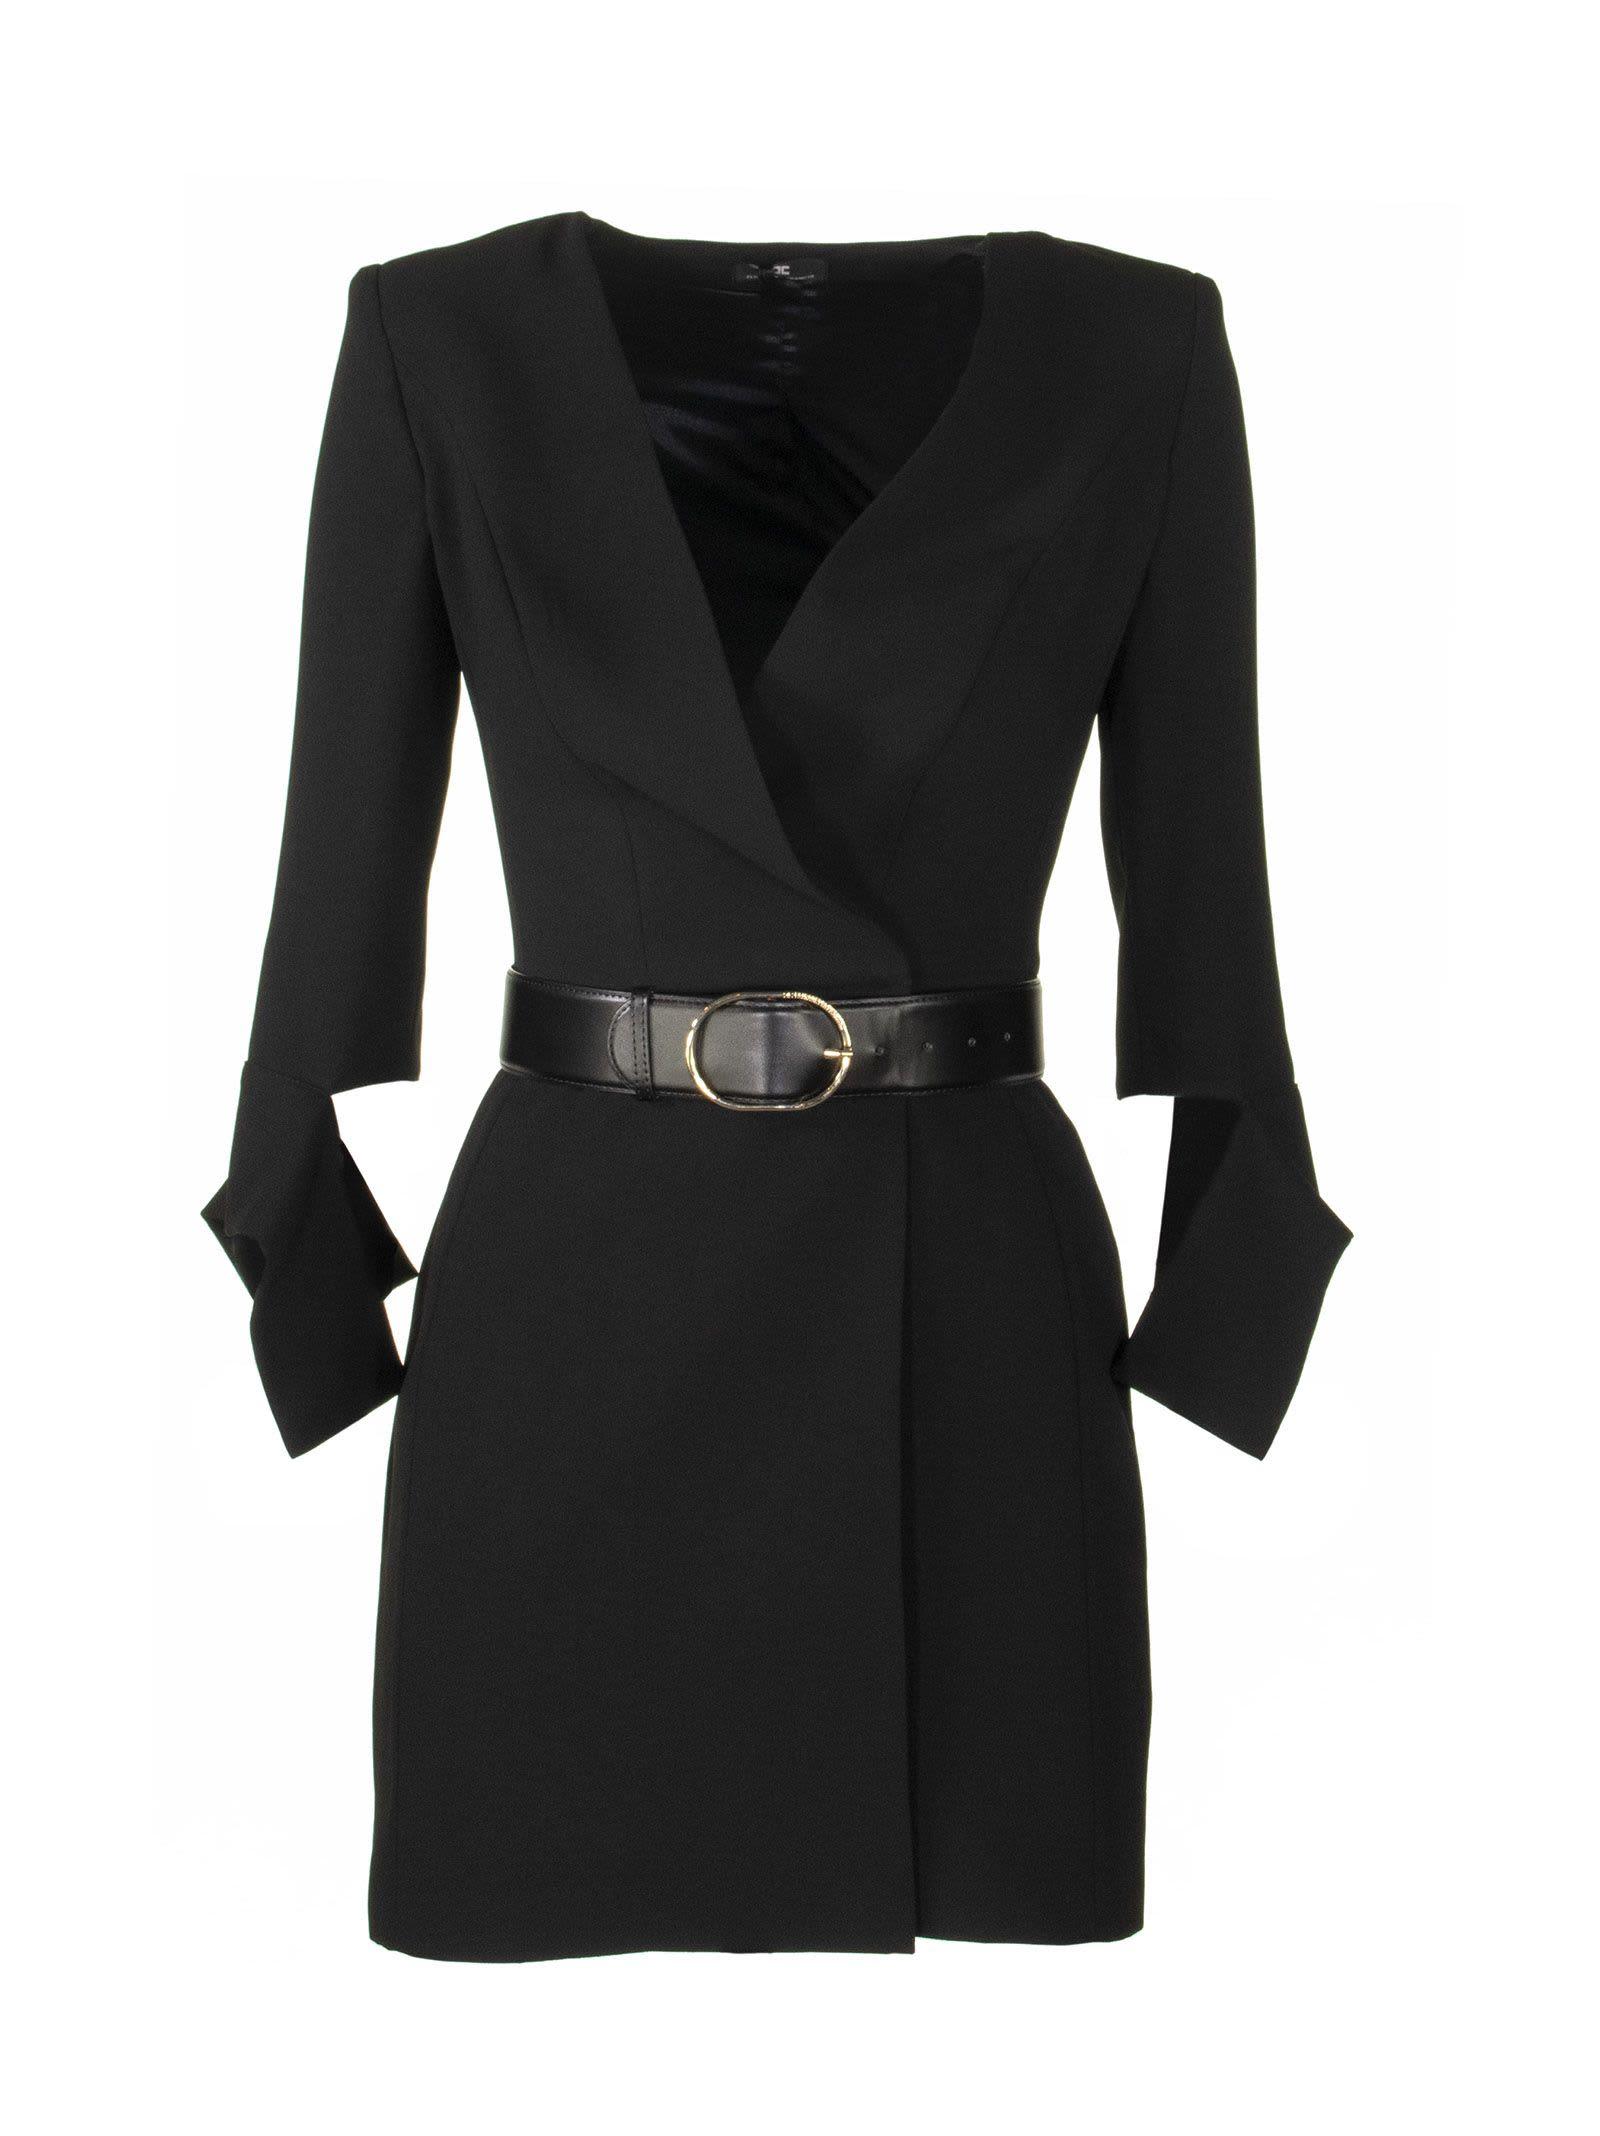 Buy Elisabetta Franchi Celyn B. Mini Dress With Belt online, shop Elisabetta Franchi Celyn B. with free shipping